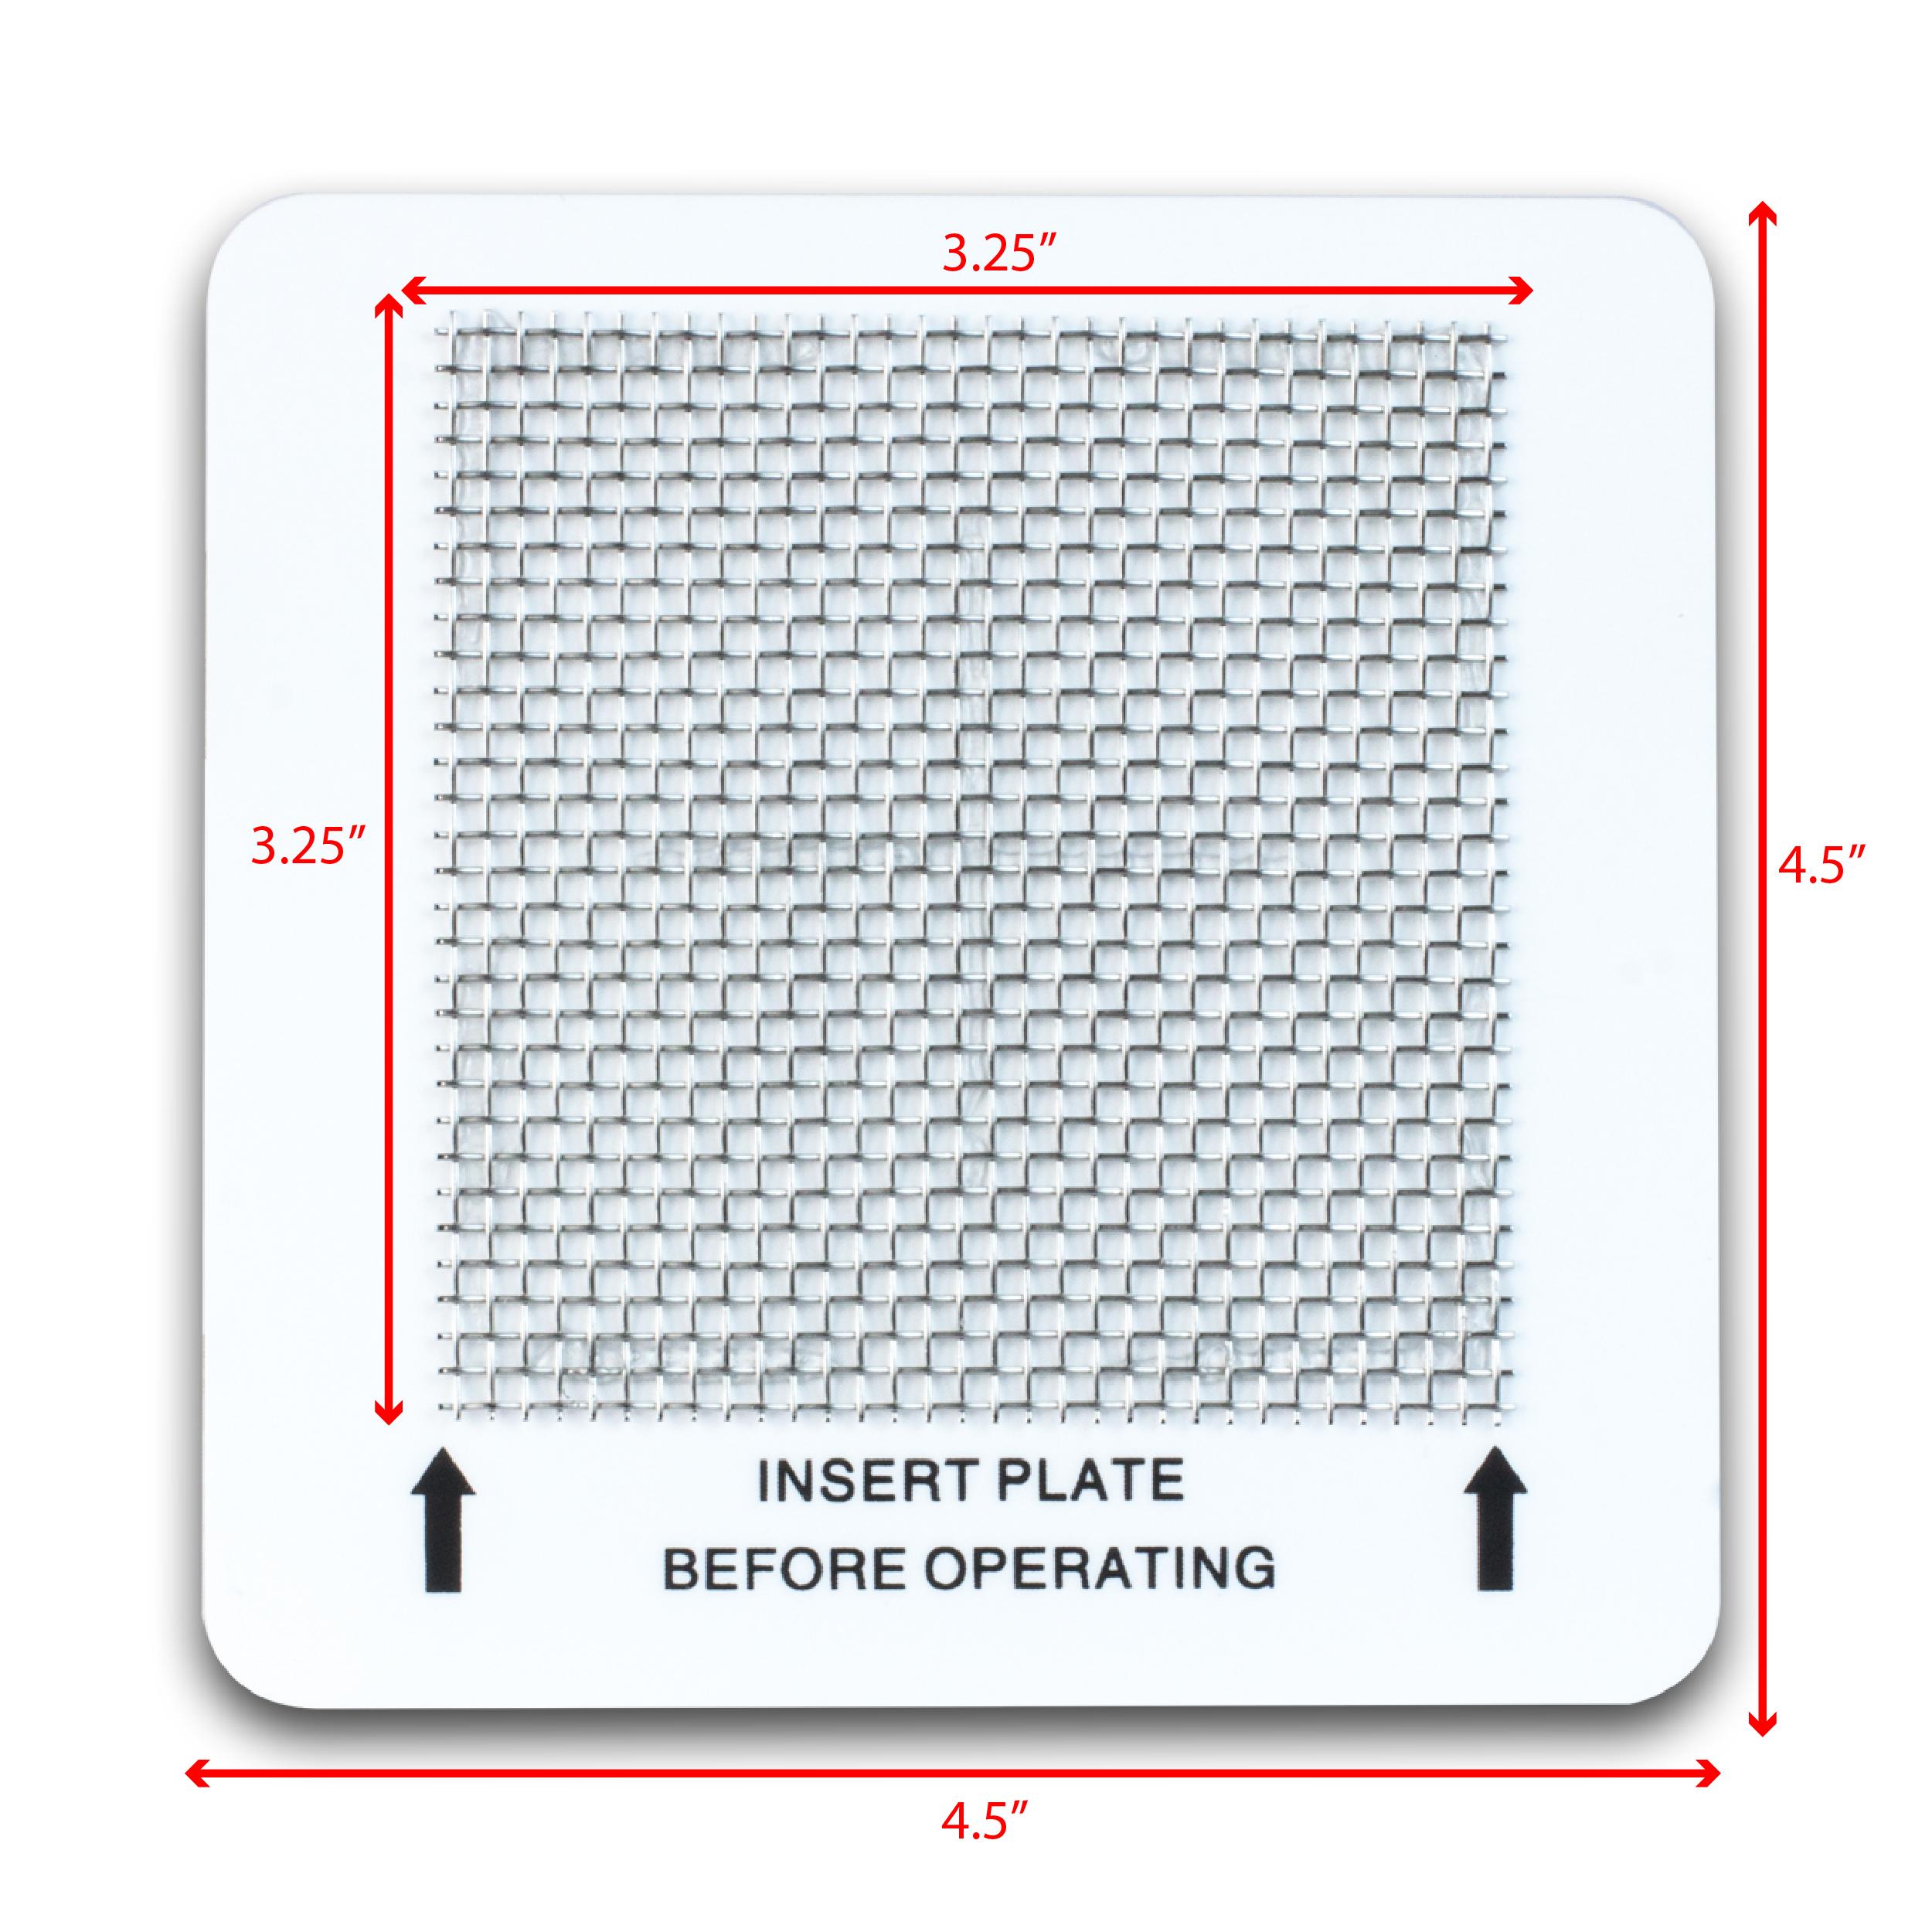 2 ozone plates for healthy living vollara alpine ecoquest